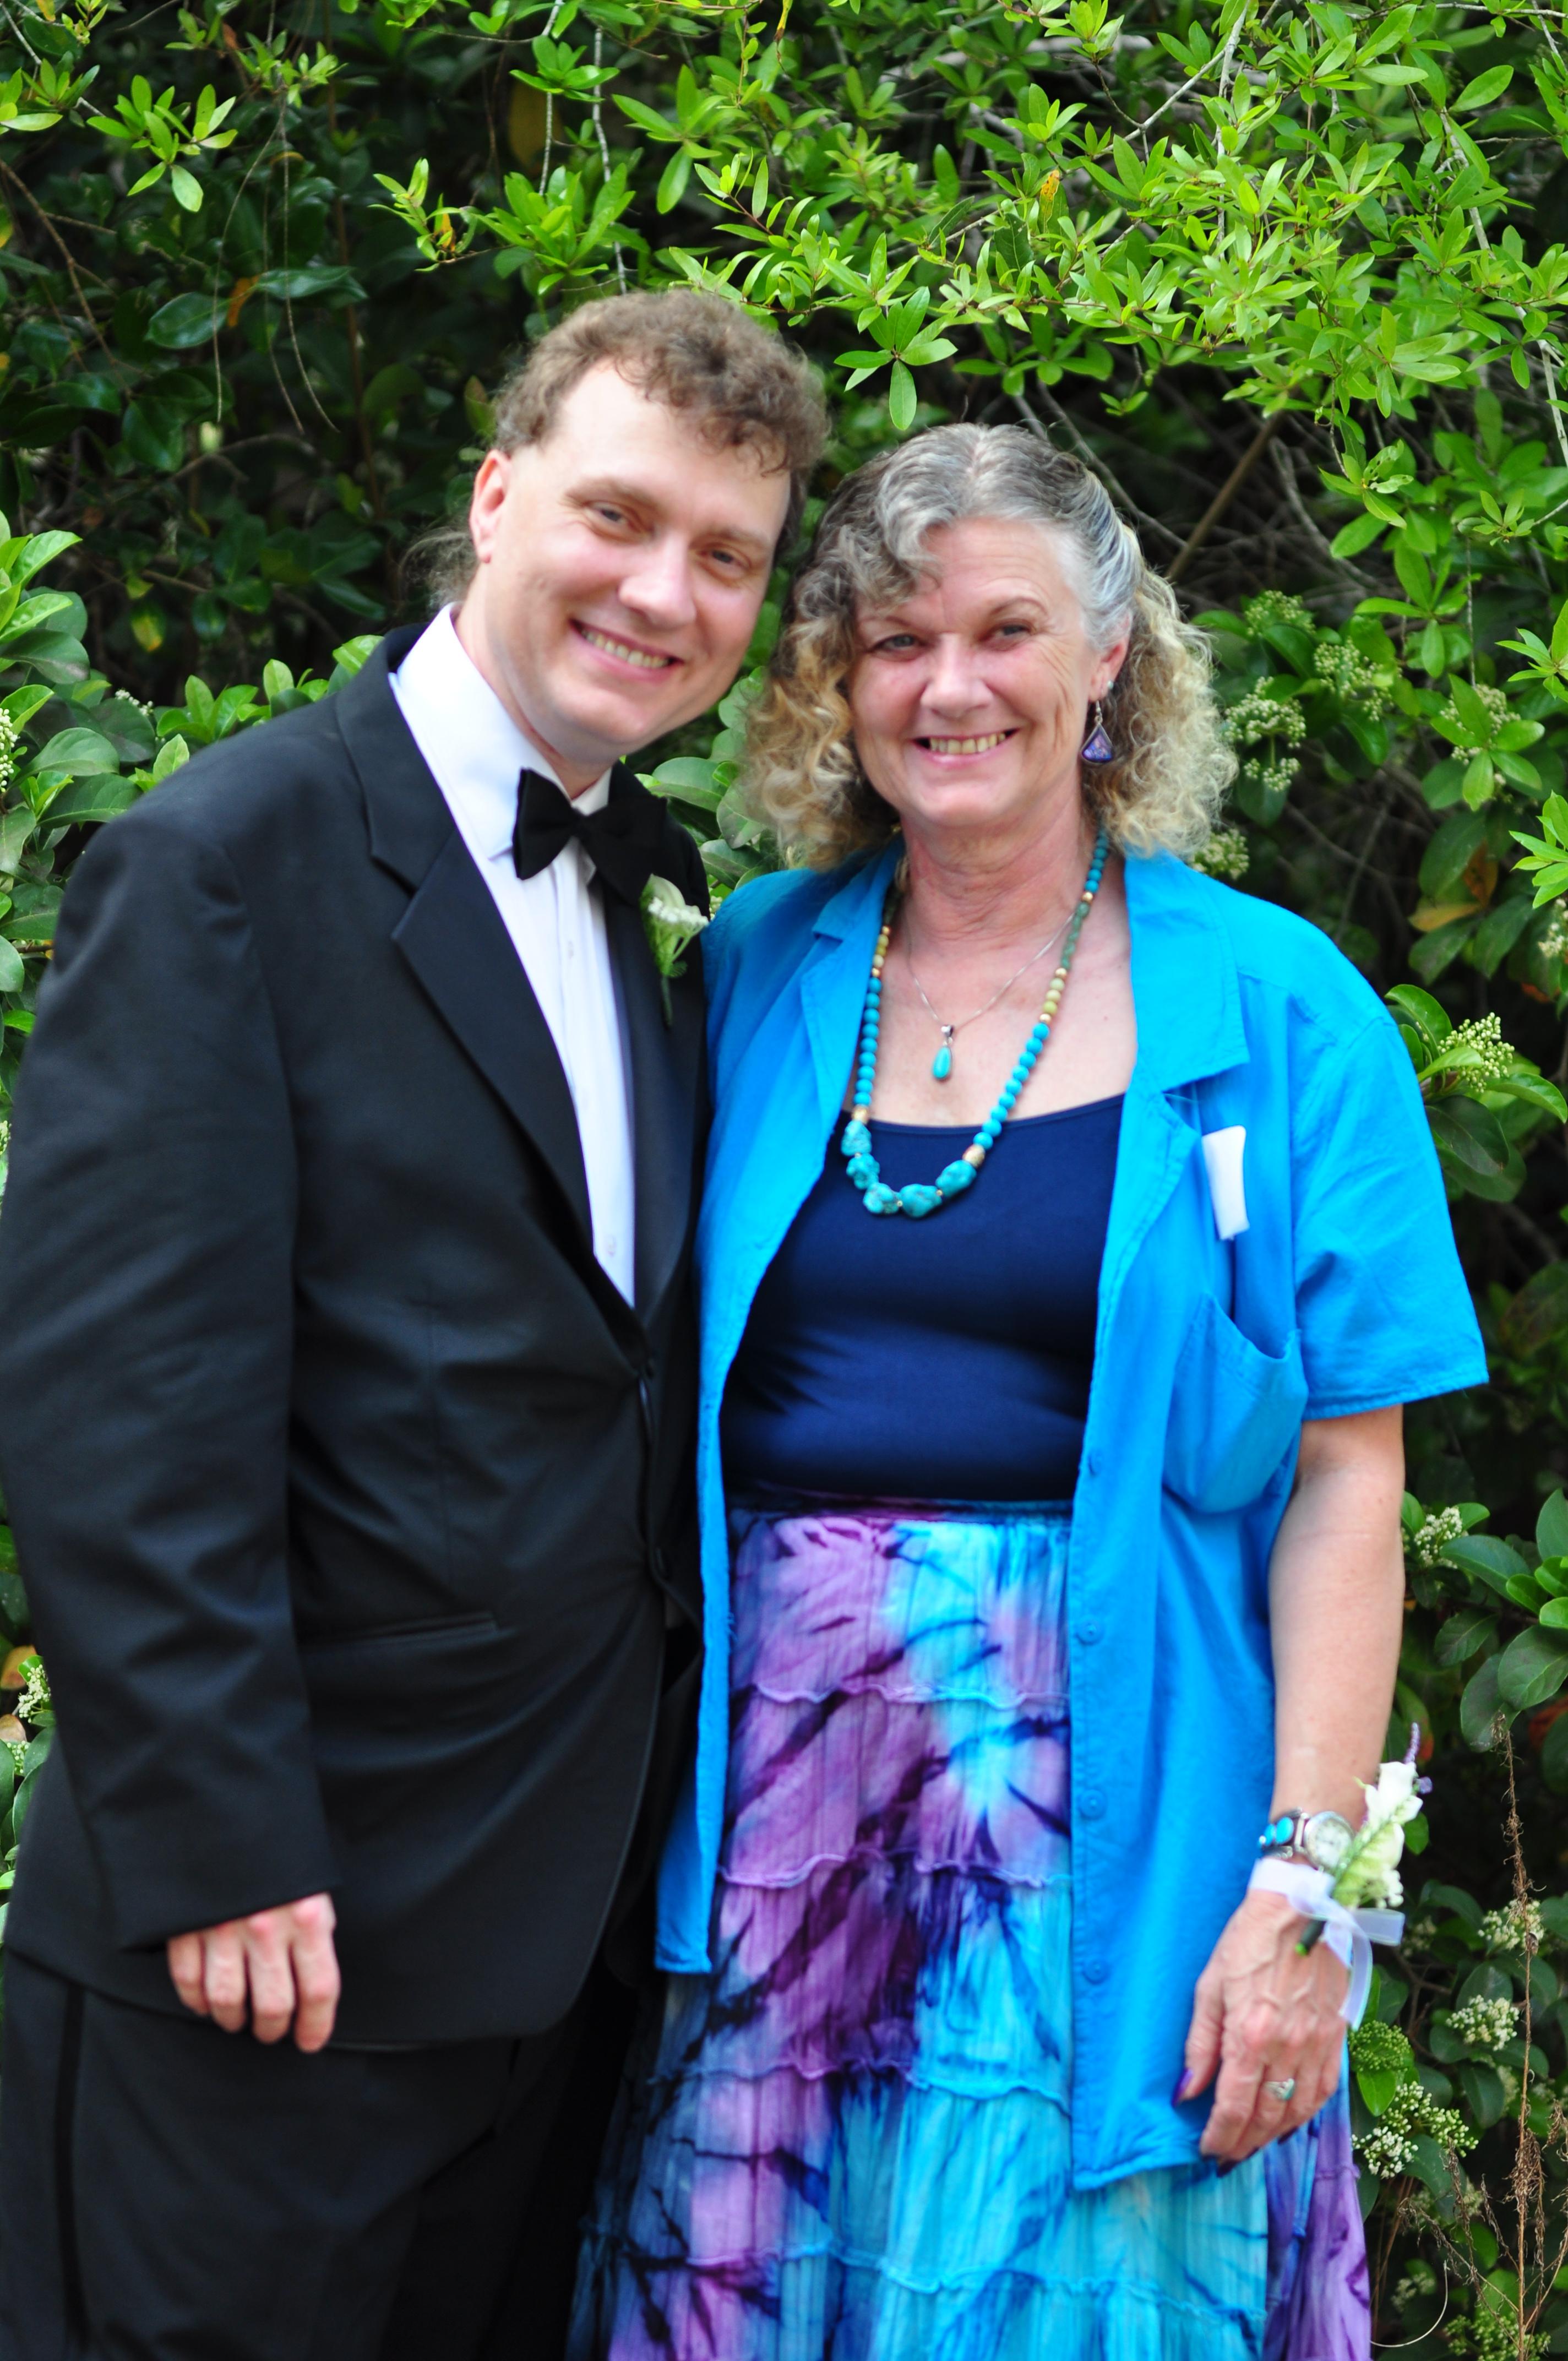 emily-and-travis-4-1-2013-april-fools-wedding-386